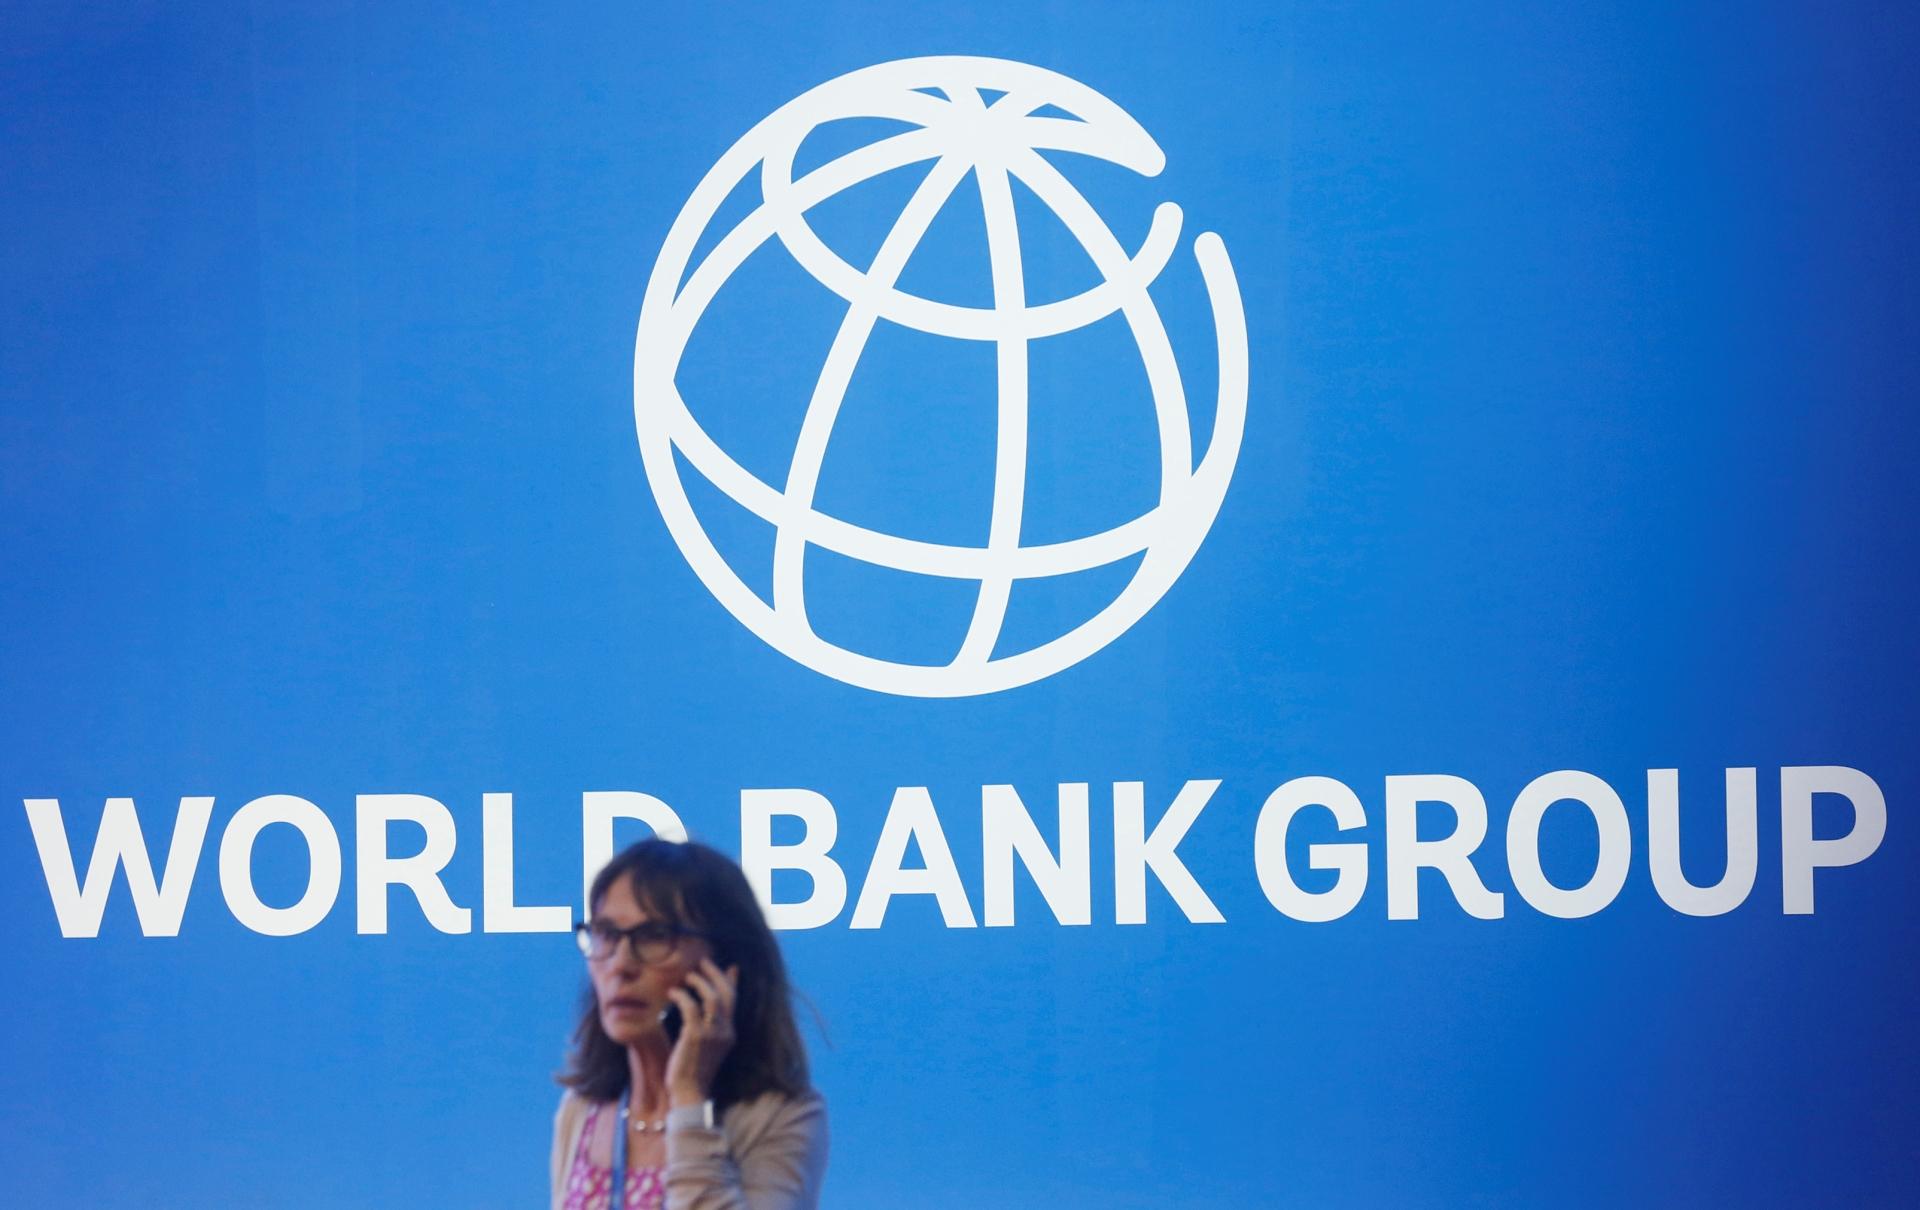 World Bank Ease Of Doing Business 2020.Malaysia Ranks 12th In World Bank Doing Business 2020 Report